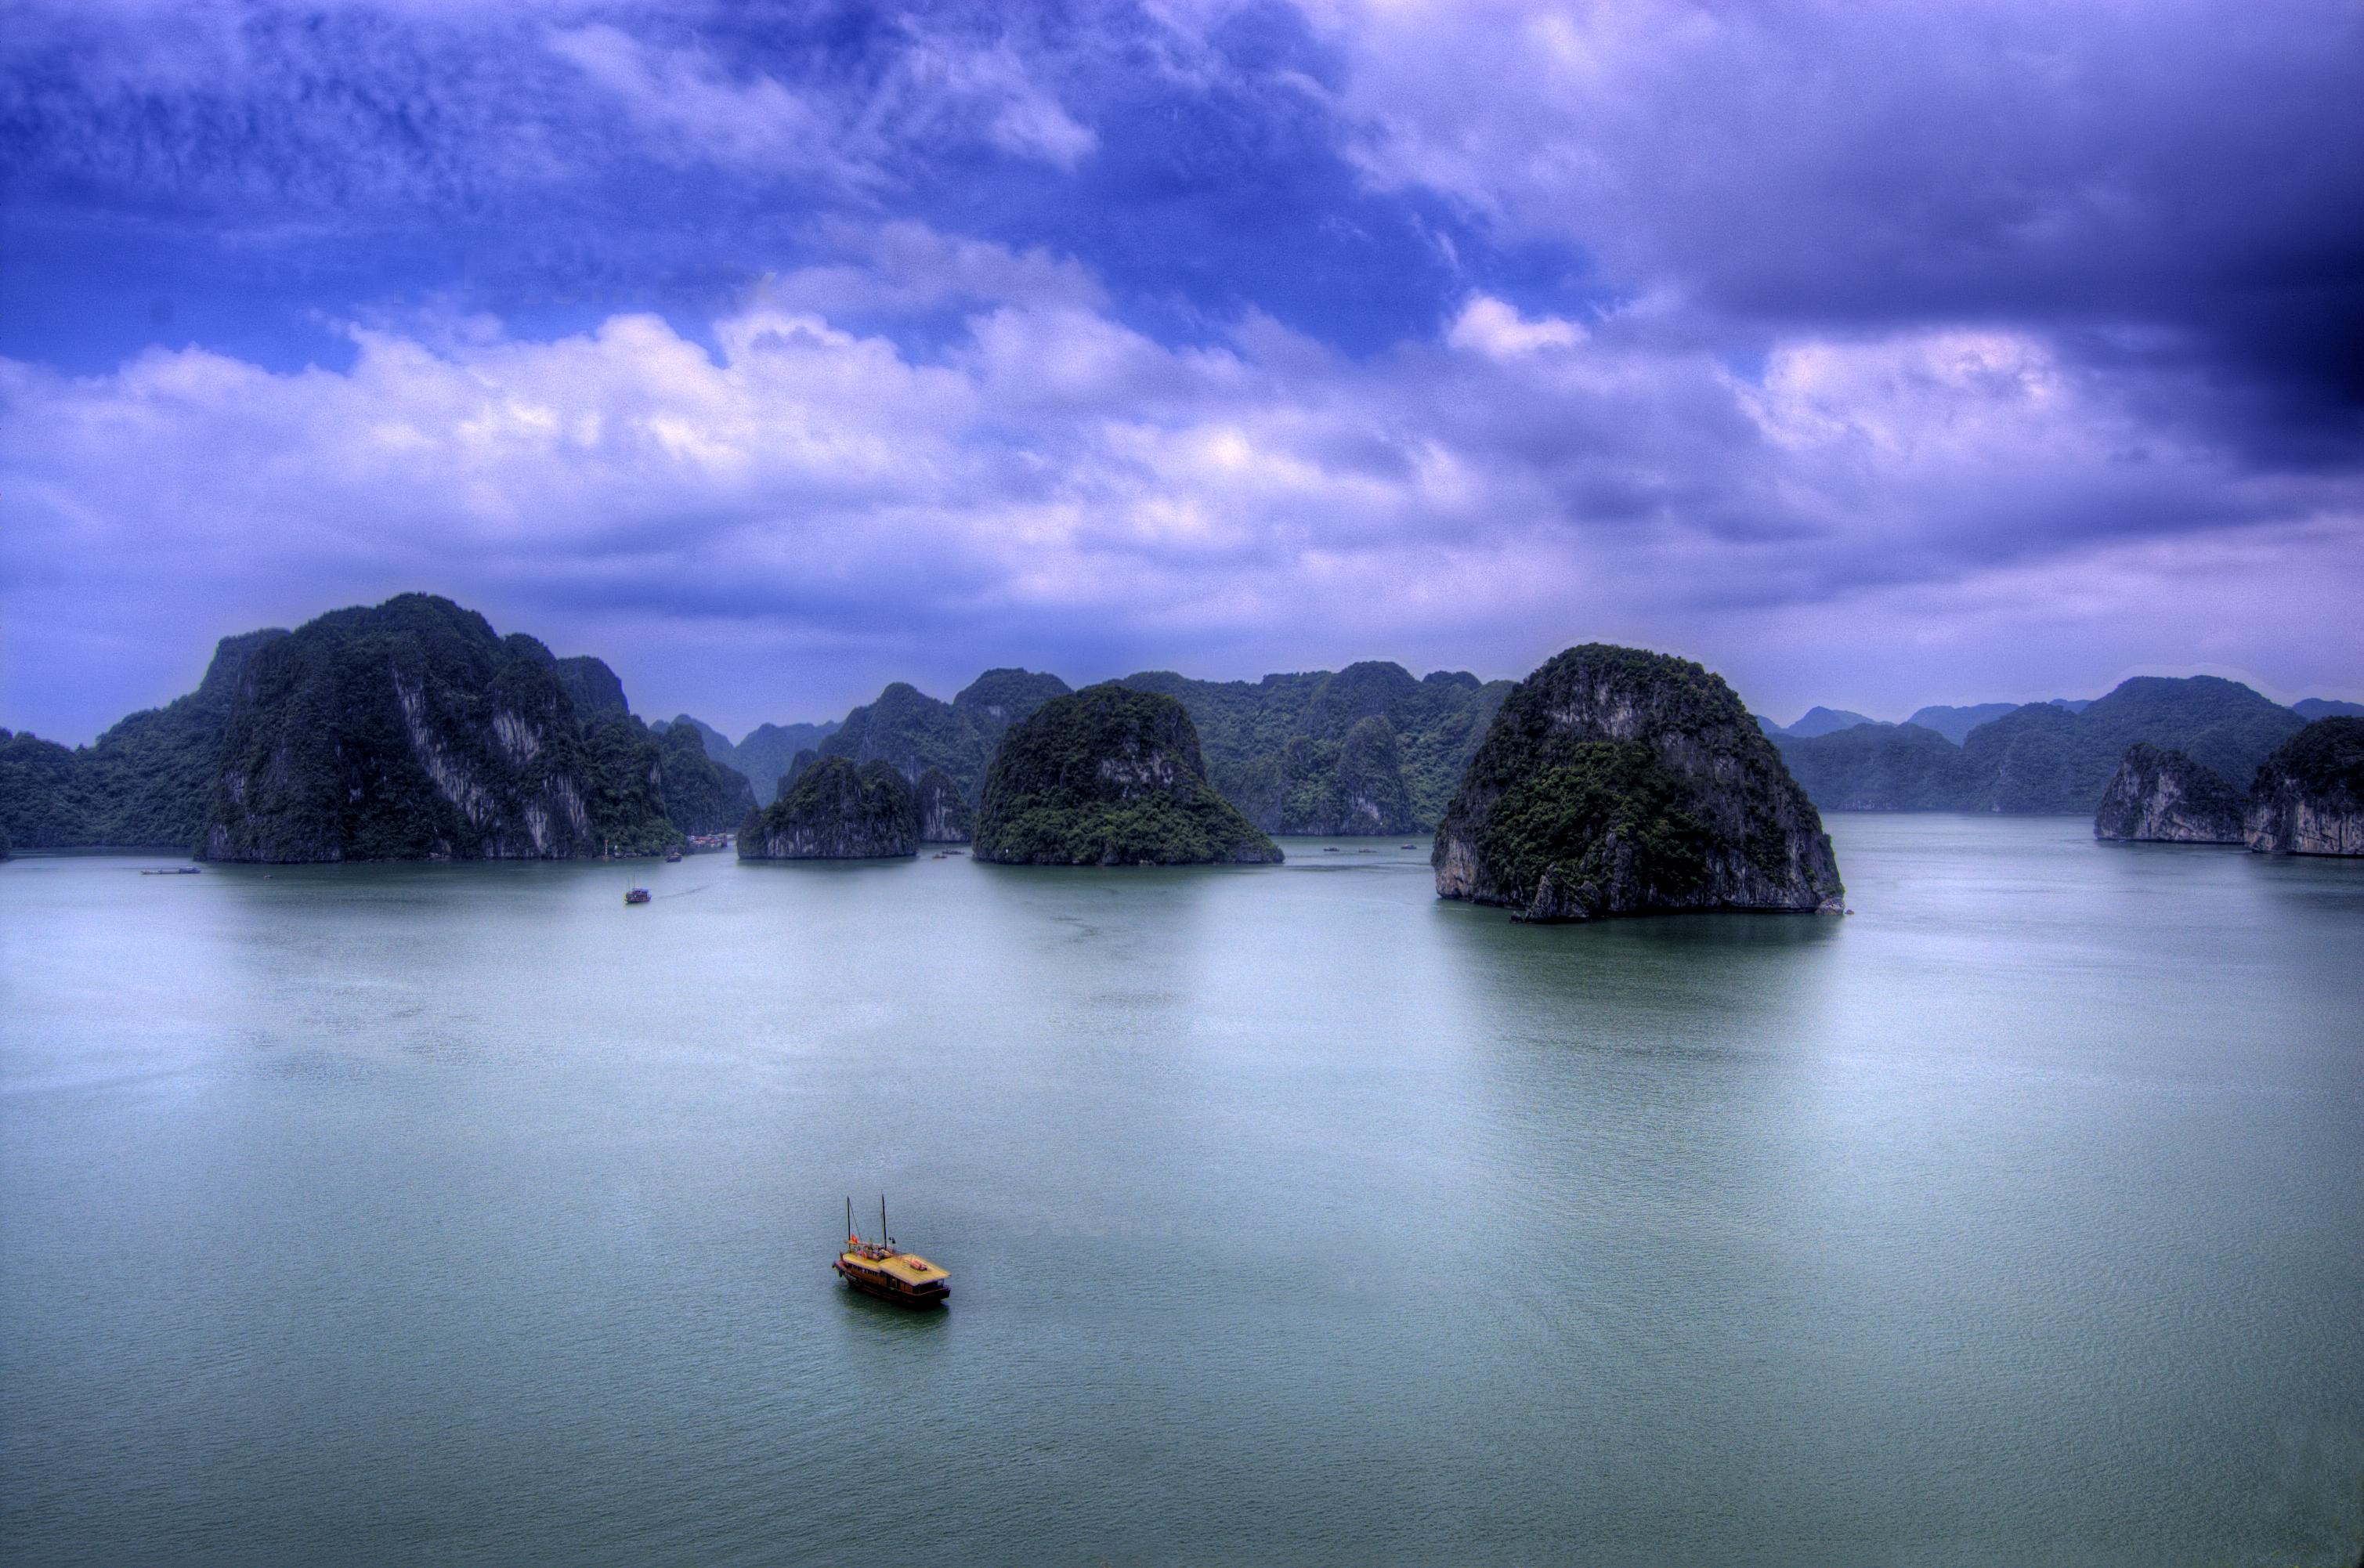 Granite columns of Rock at Halong Bay, Vietnam